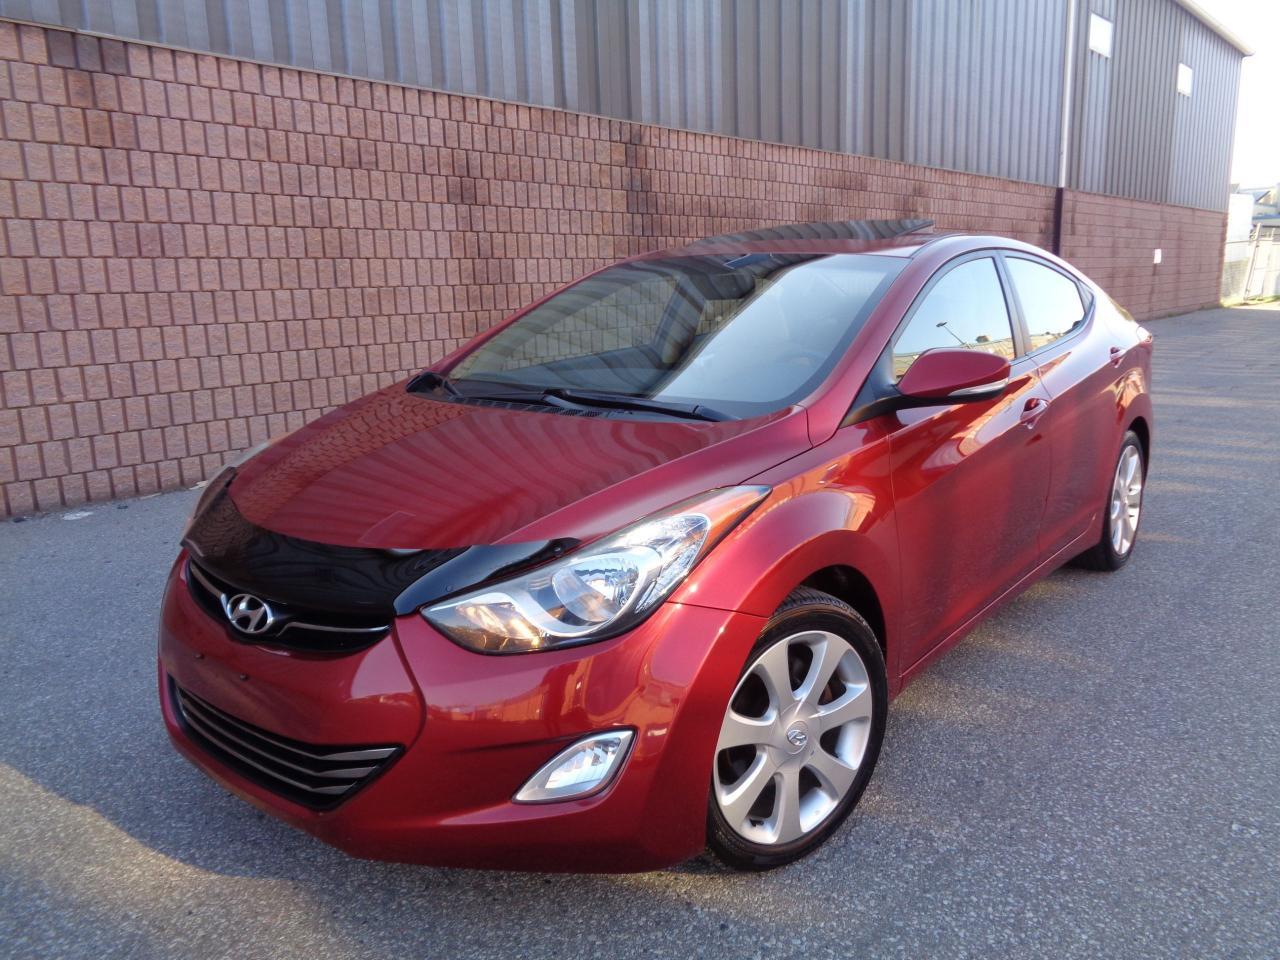 Photo of Red 2012 Hyundai Elantra